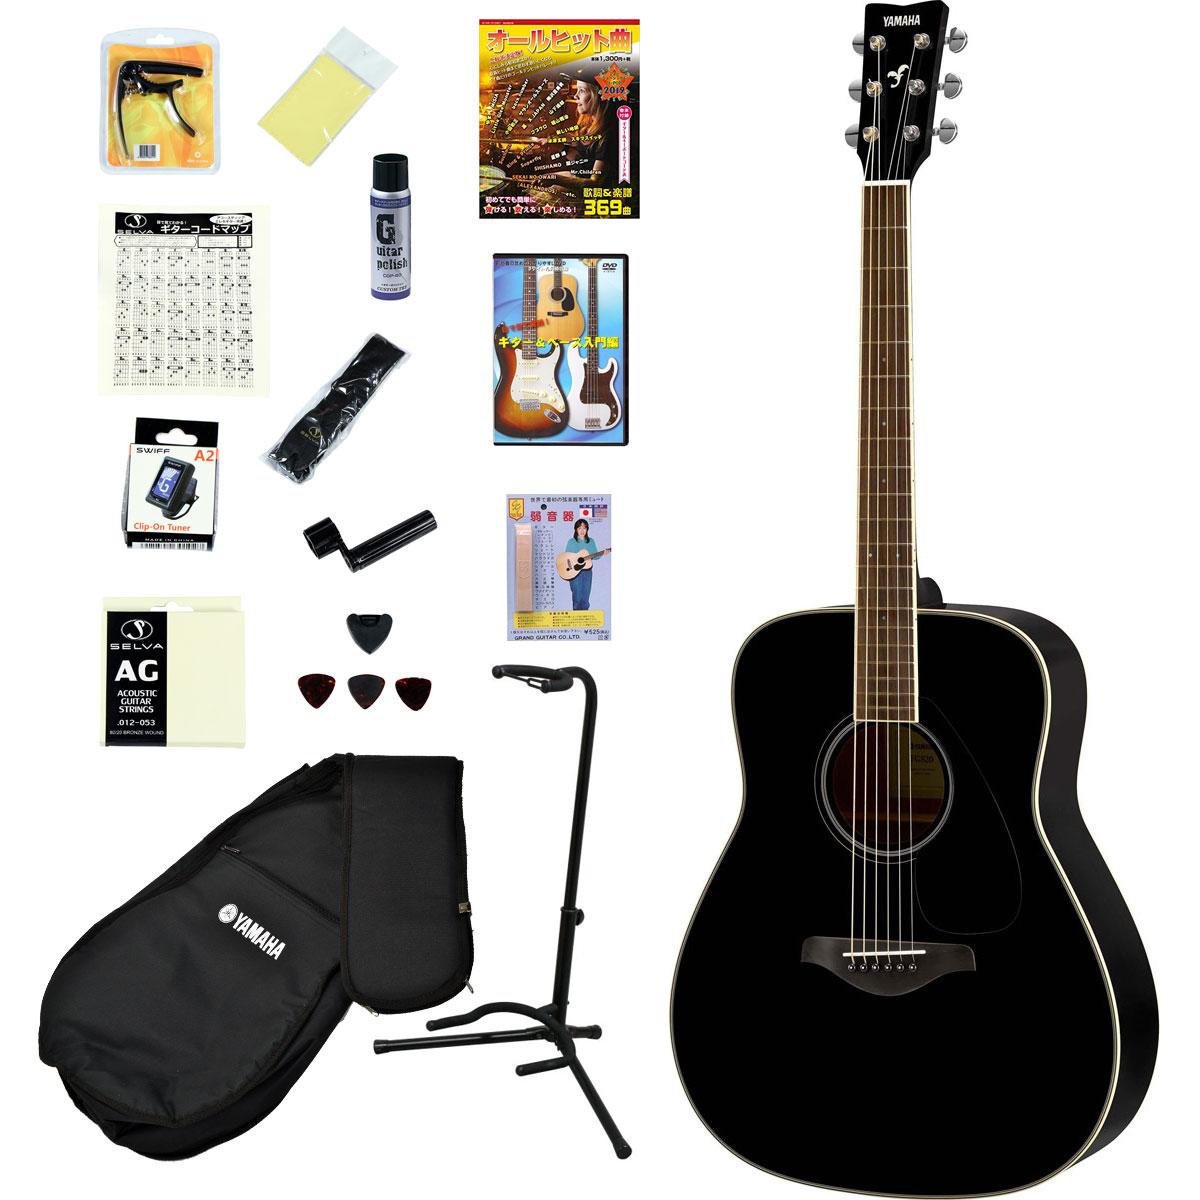 YAMAHA / FG820 BL( ブラック) 【オールヒット曲歌本17点入門セット】【楽譜が付いたお買い得セット】 ヤマハ アコースティックギター アコギ FG-820 入門 初心者【YRK】